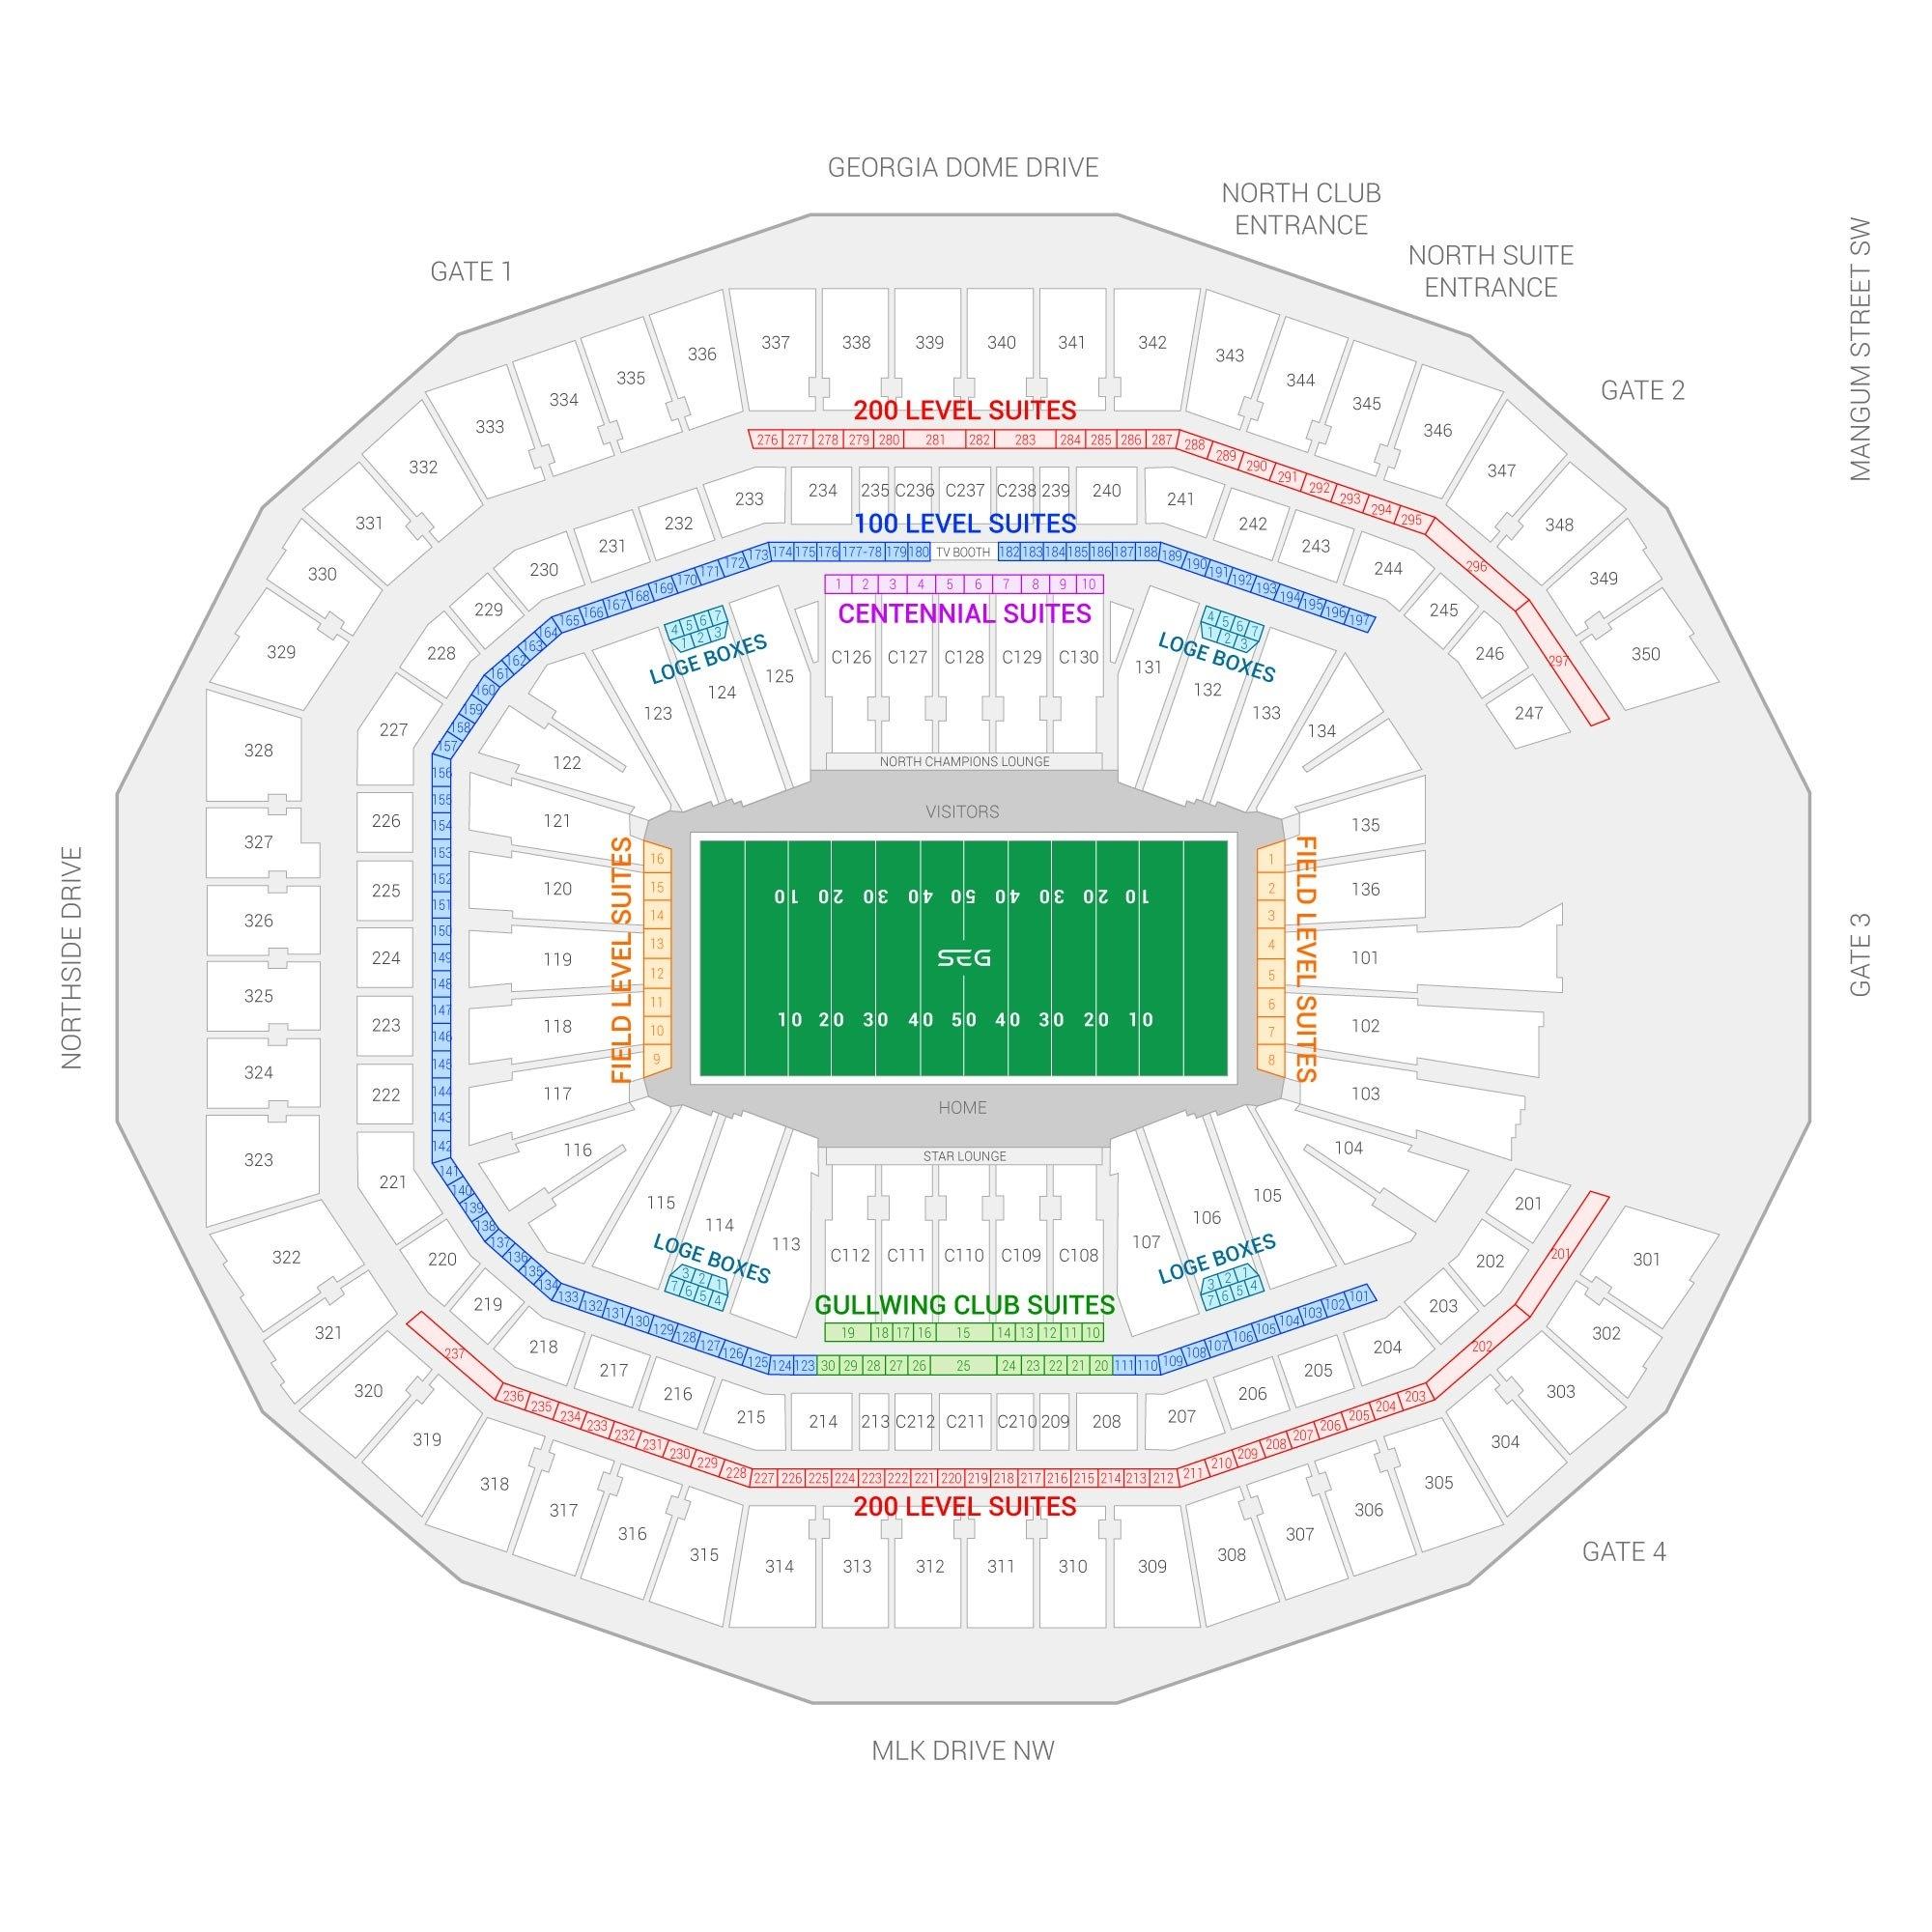 Super Bowl Liii Suite Rentals | Mercedes-Benz Stadium with Super Bowl Seating Capacity 2019